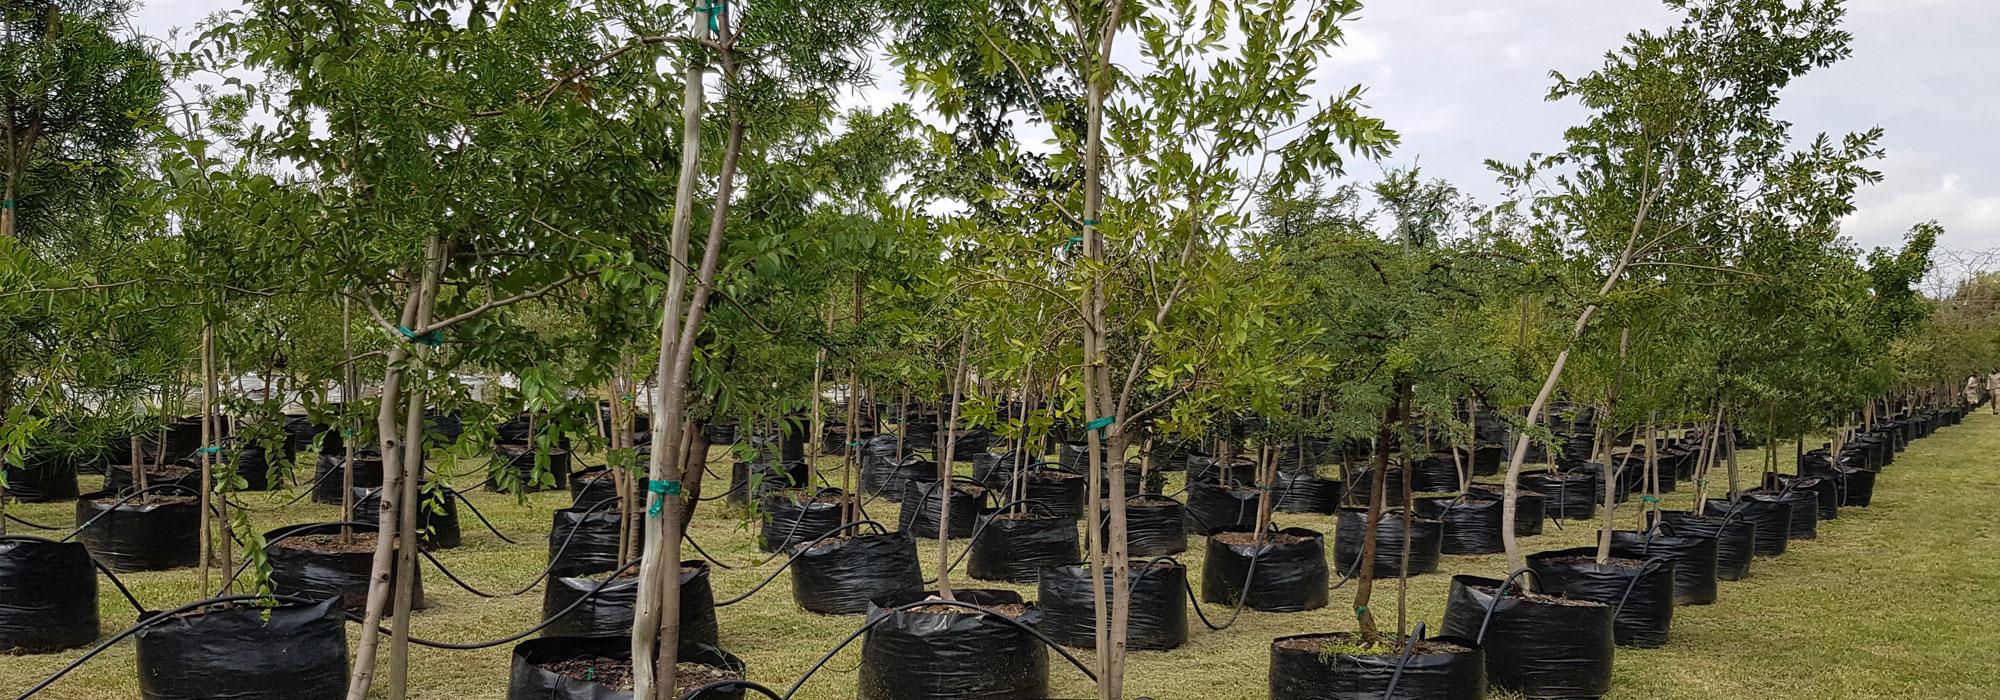 Hardy Trees